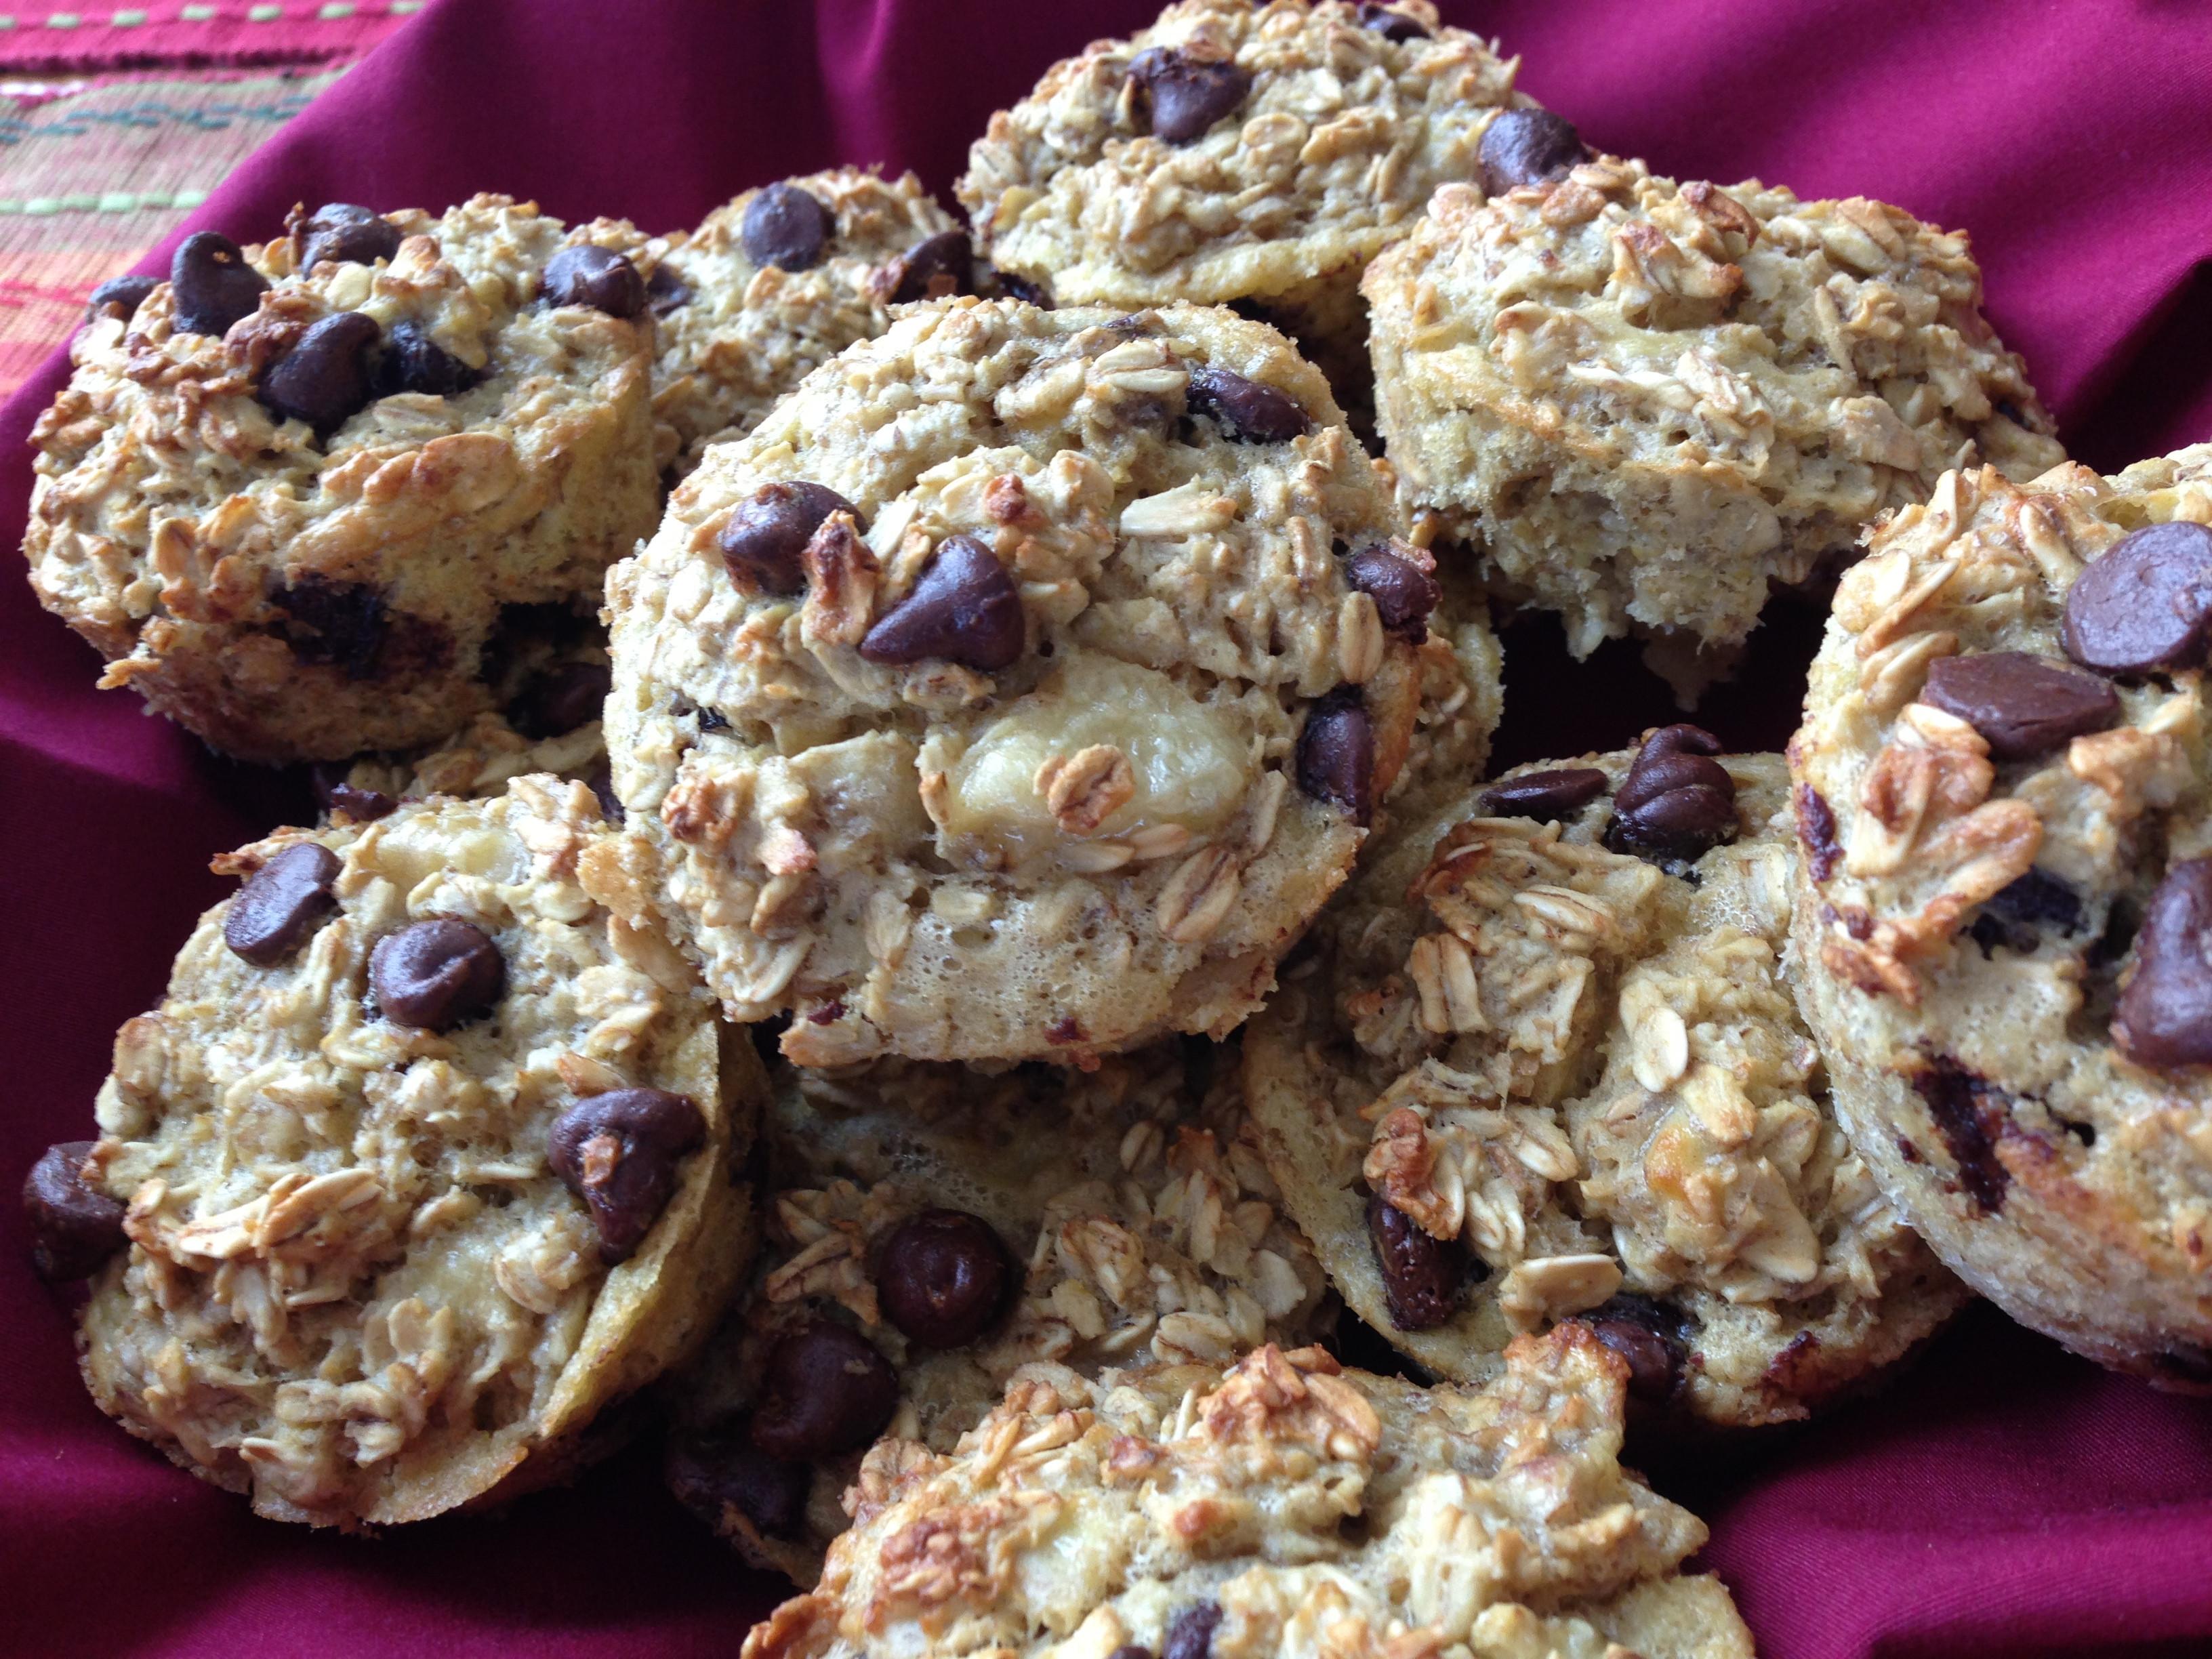 Healthy Banana Oatmeal Chocolate Chip Muffins  Hearty Heart Healthy Oatmeal Banana Chocolate Chip